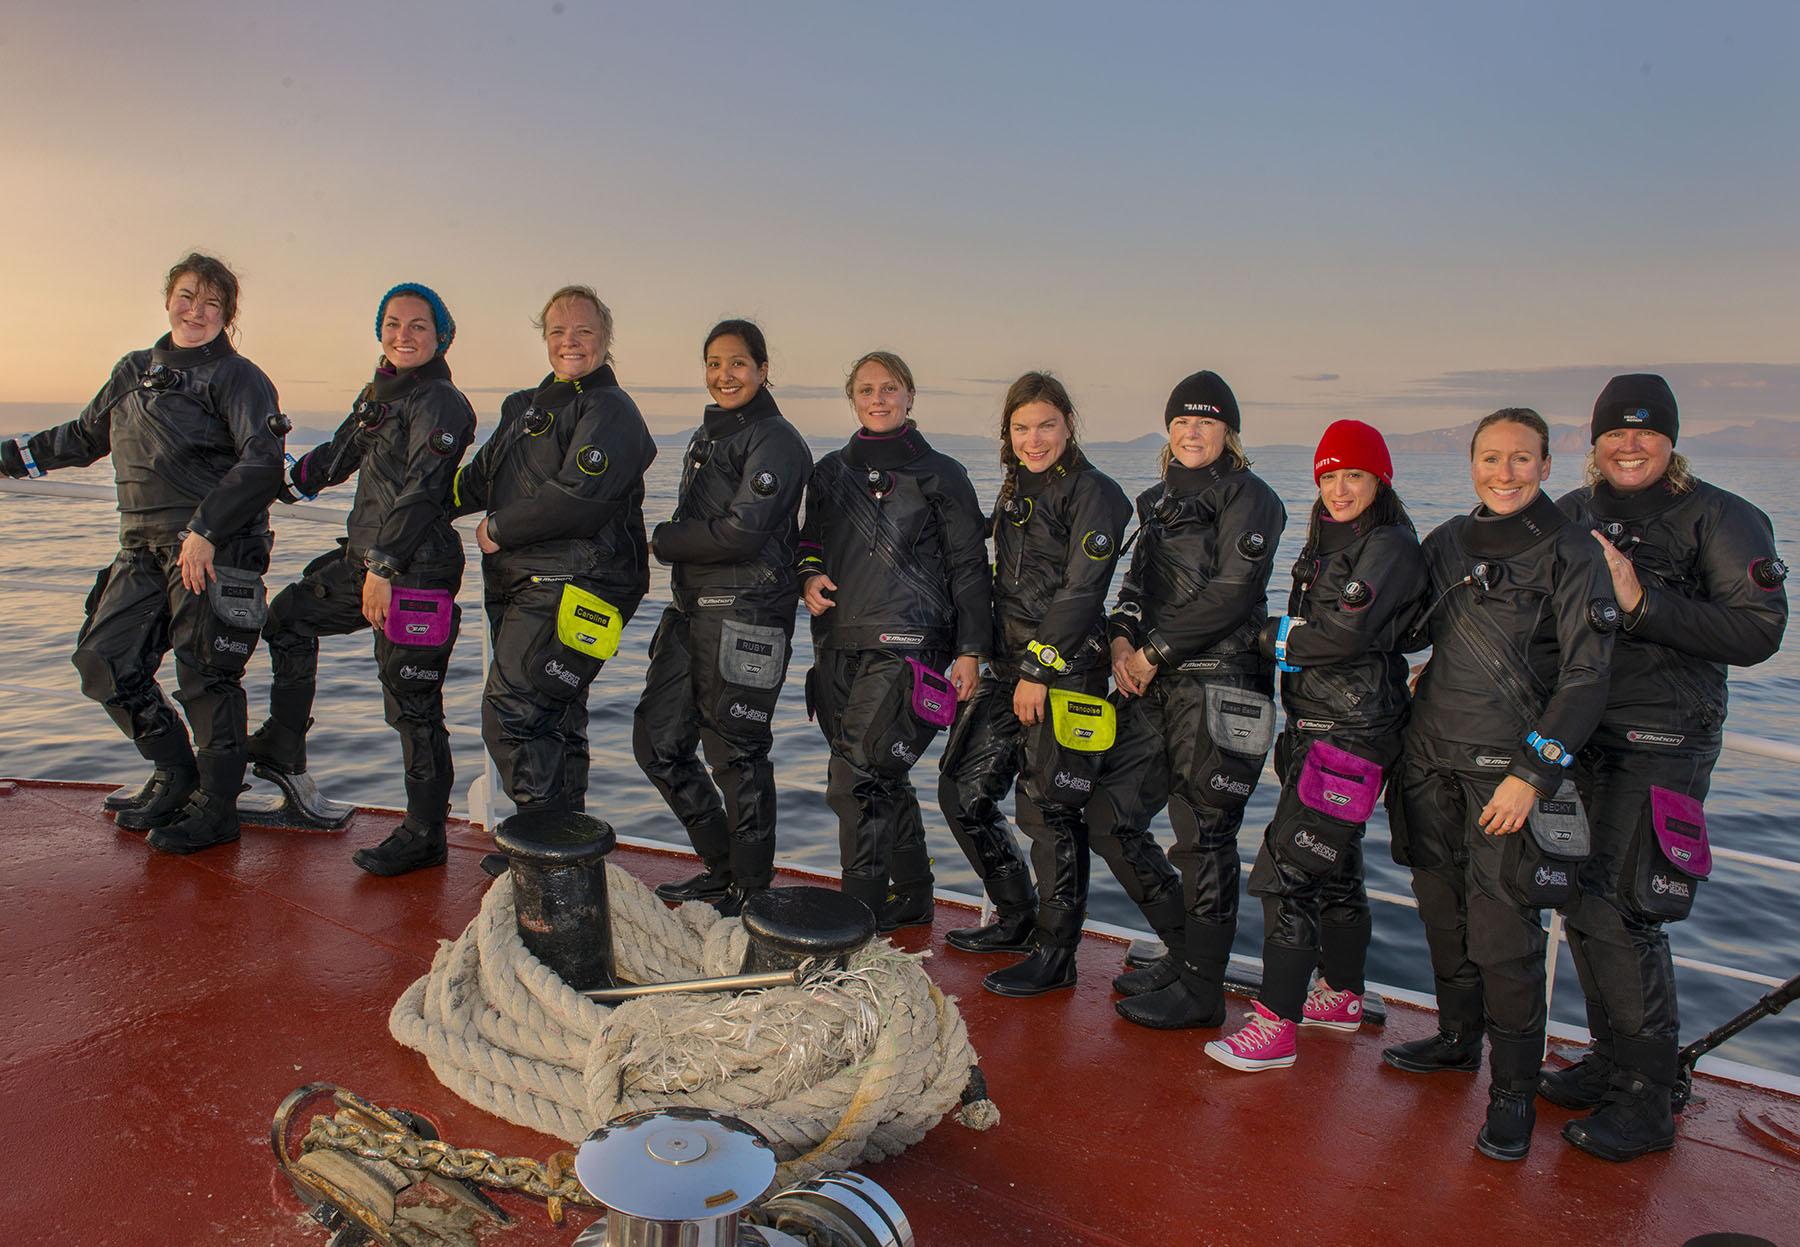 1-group-photo-after-arctic-swim-LP8_5488.jpg